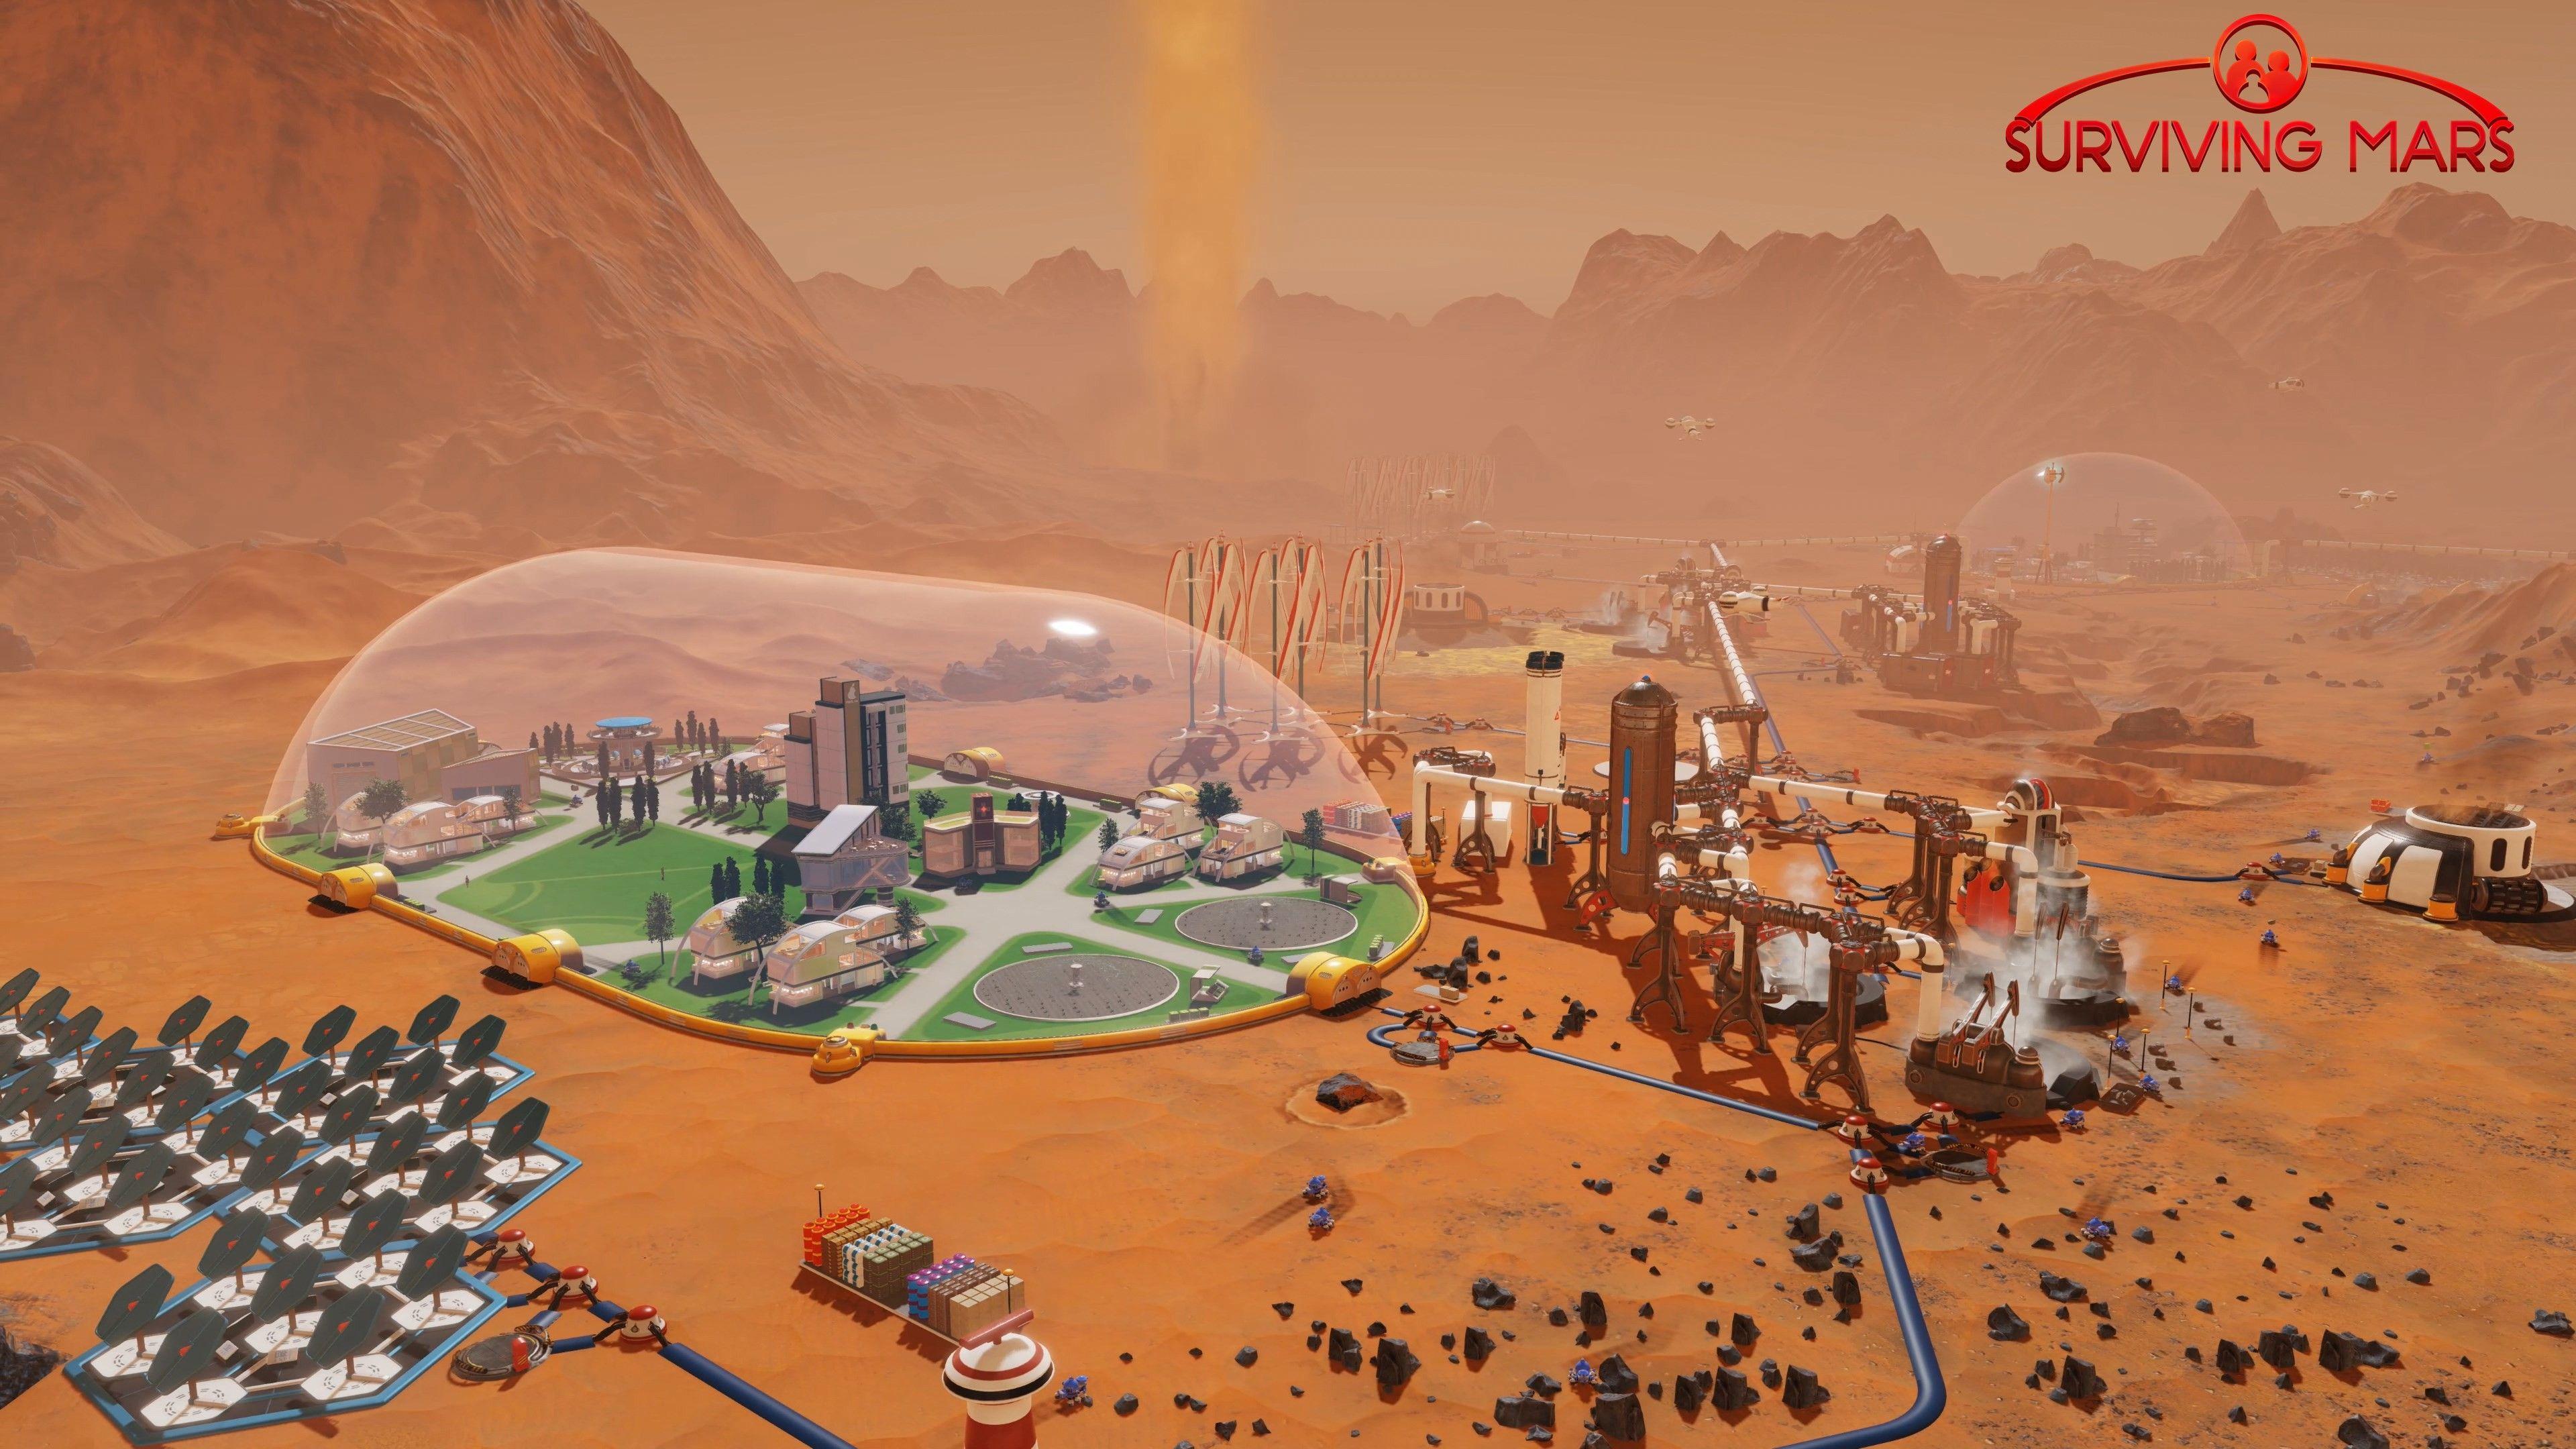 Surviving Mars Wallpapers - Wallpaper Cave